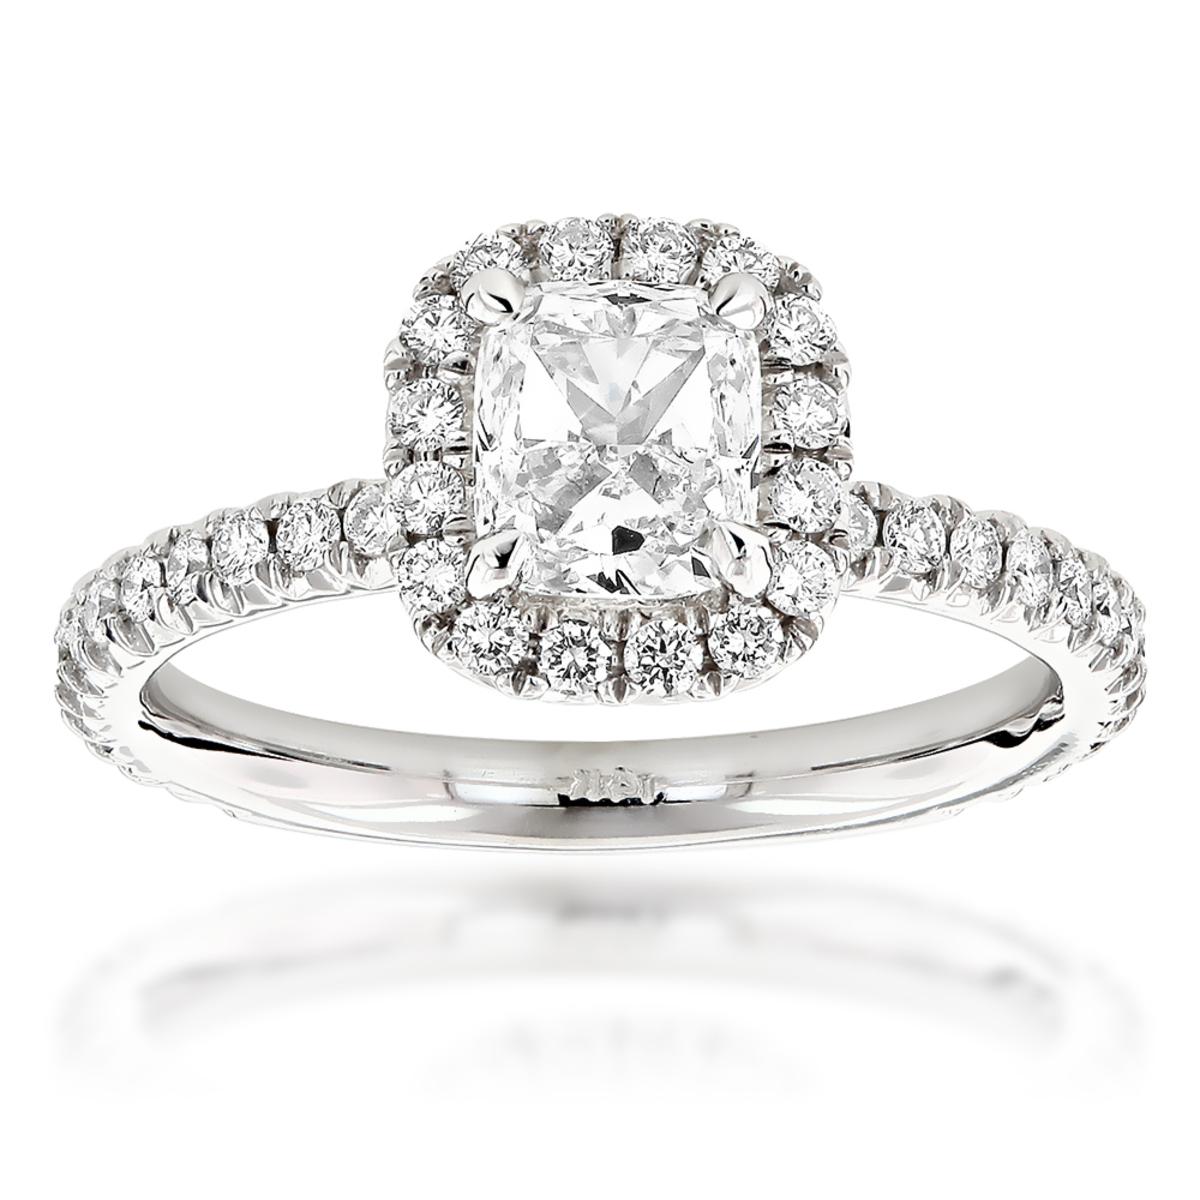 GIA Cushion Cut Diamond Engagement Ring 2.07ct 14K Gold Halo